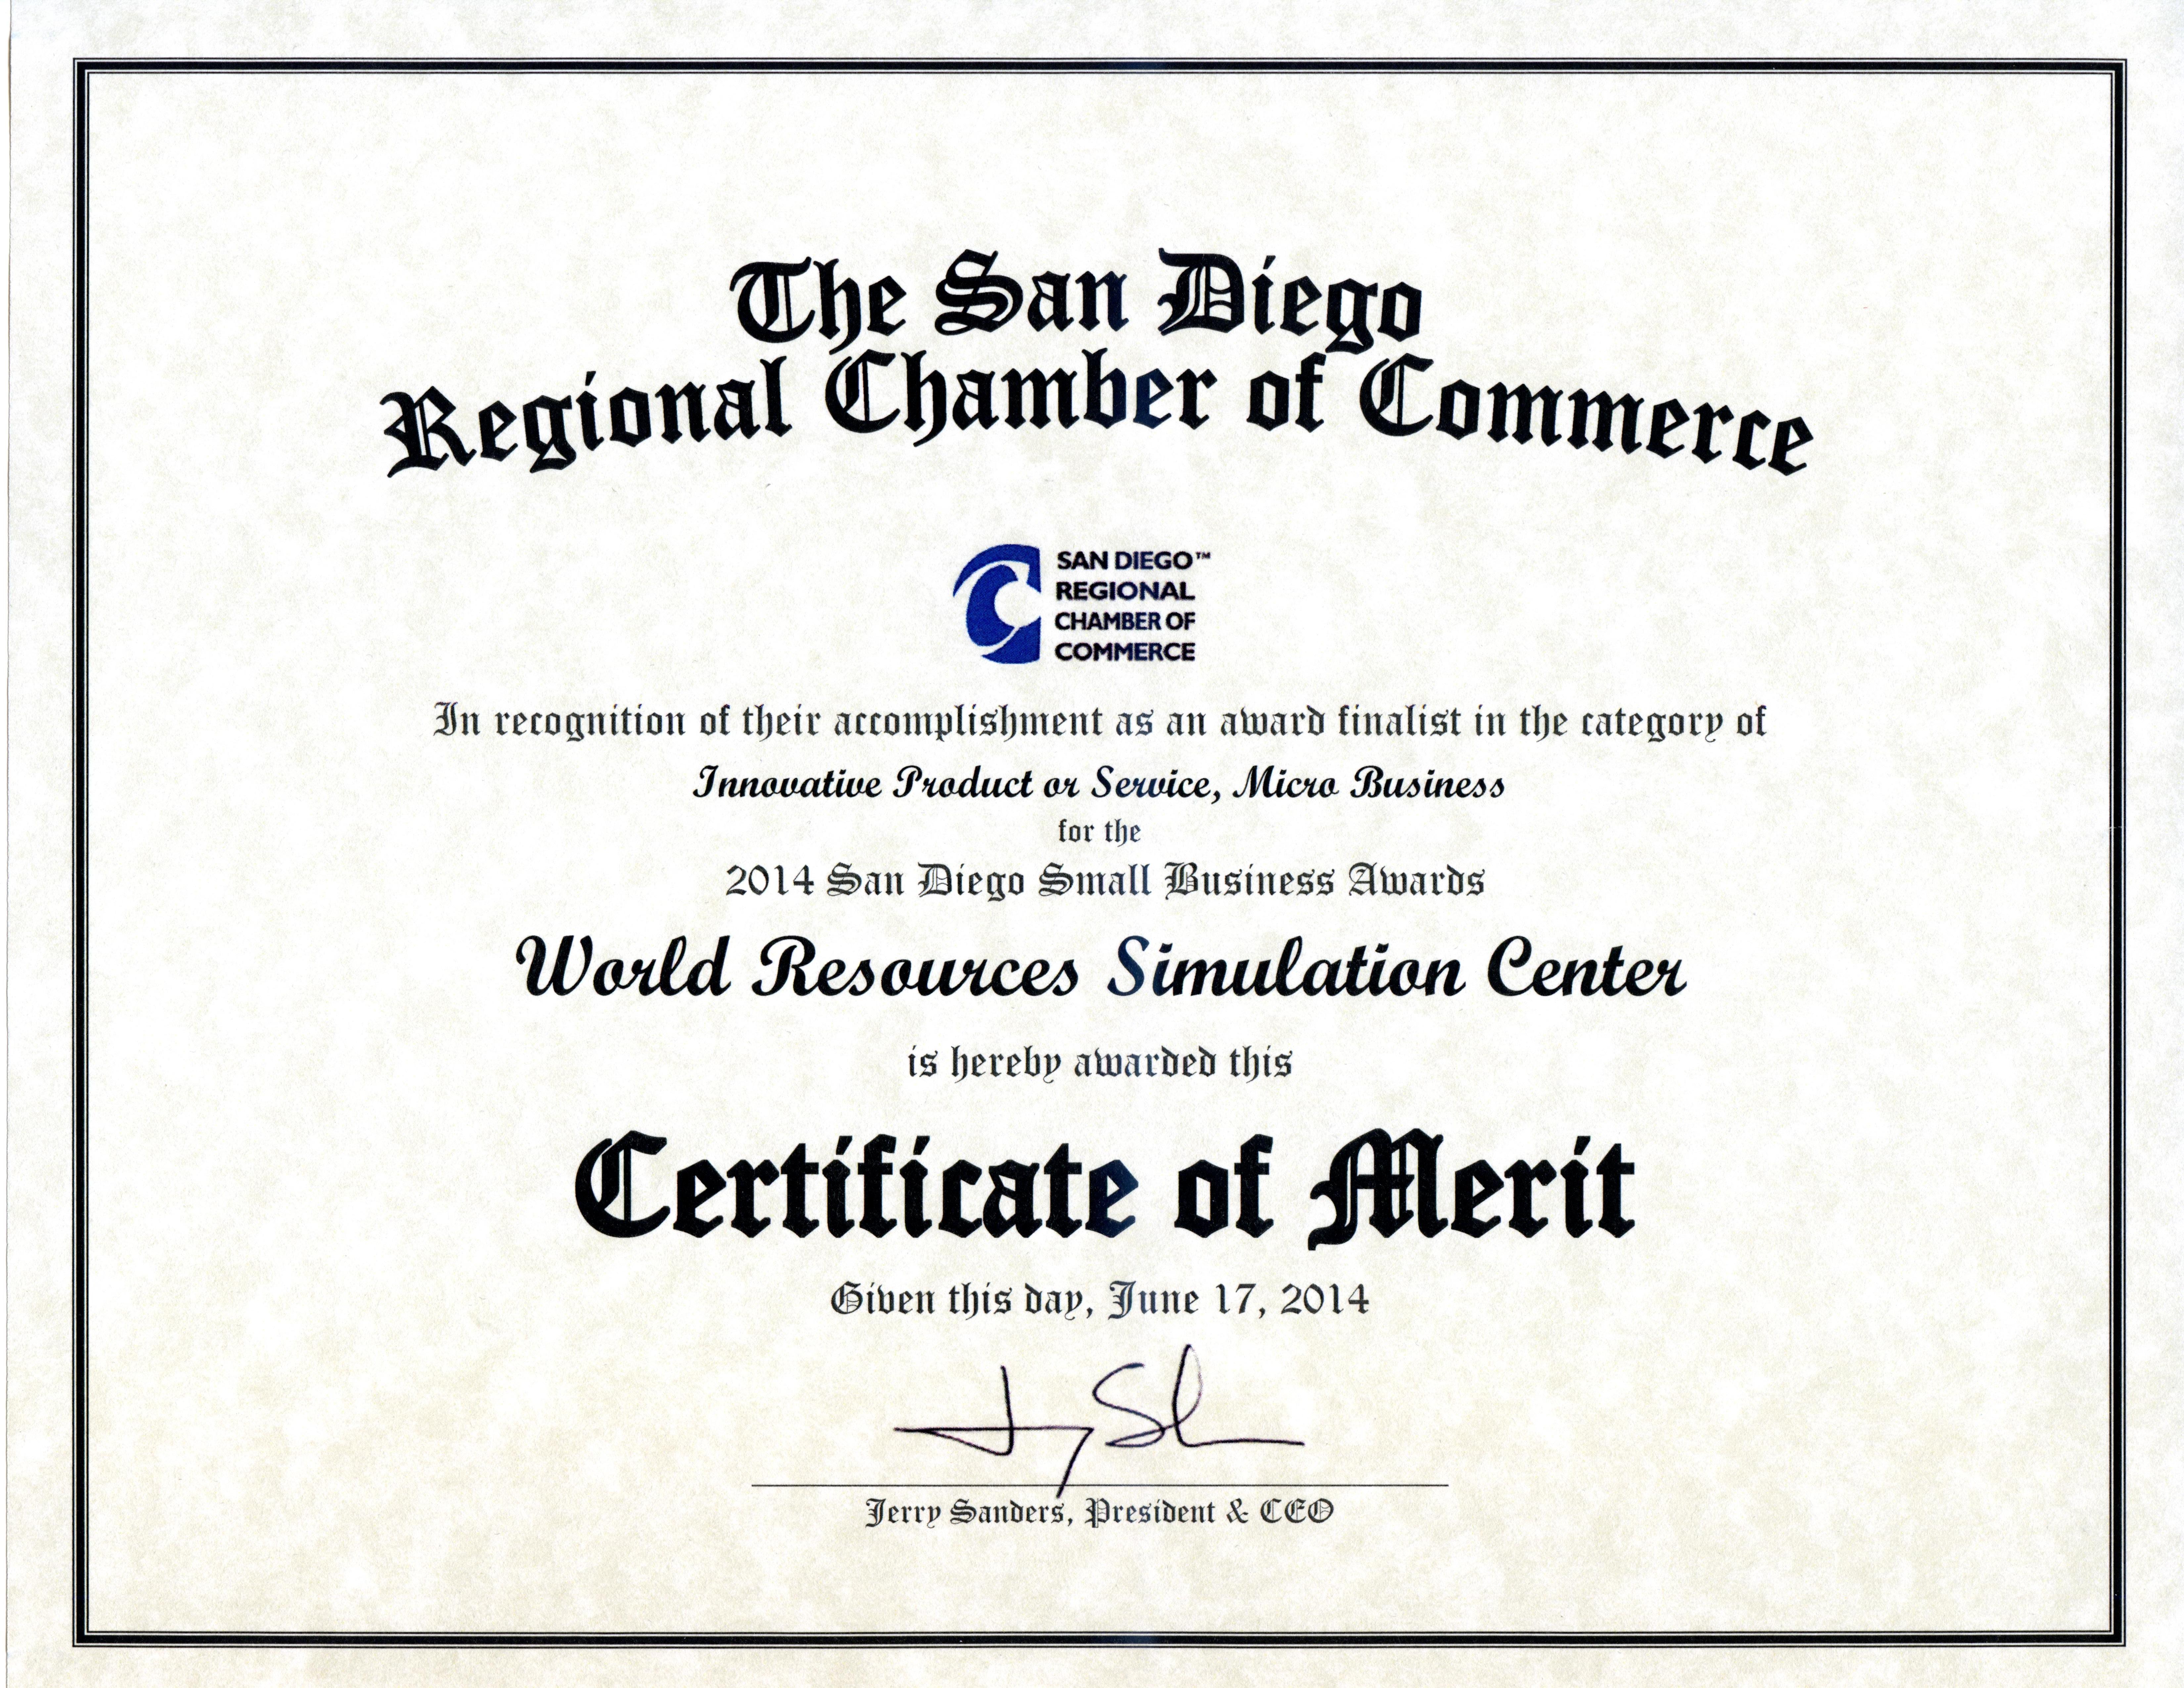 San Diego Regional Chamber Of Commerce Certificate Of Merit